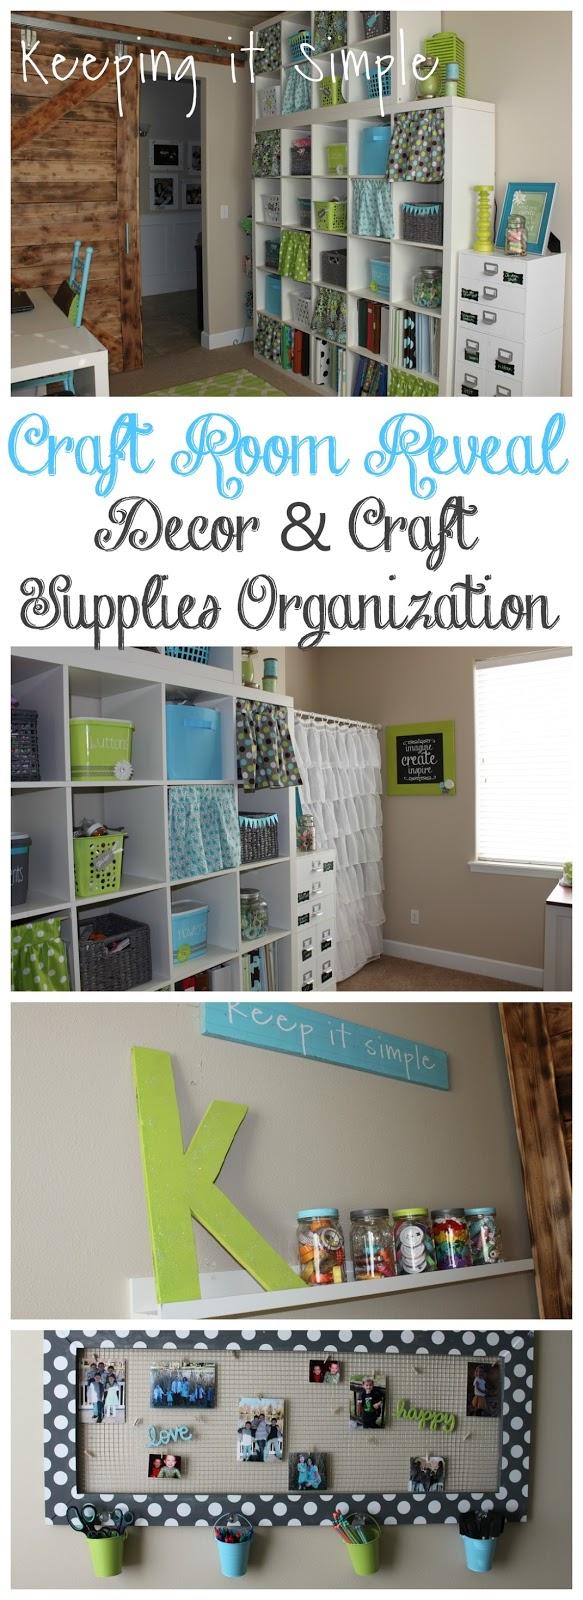 Craft room decor ideas and craft supplies organization for Craft supply organization ideas